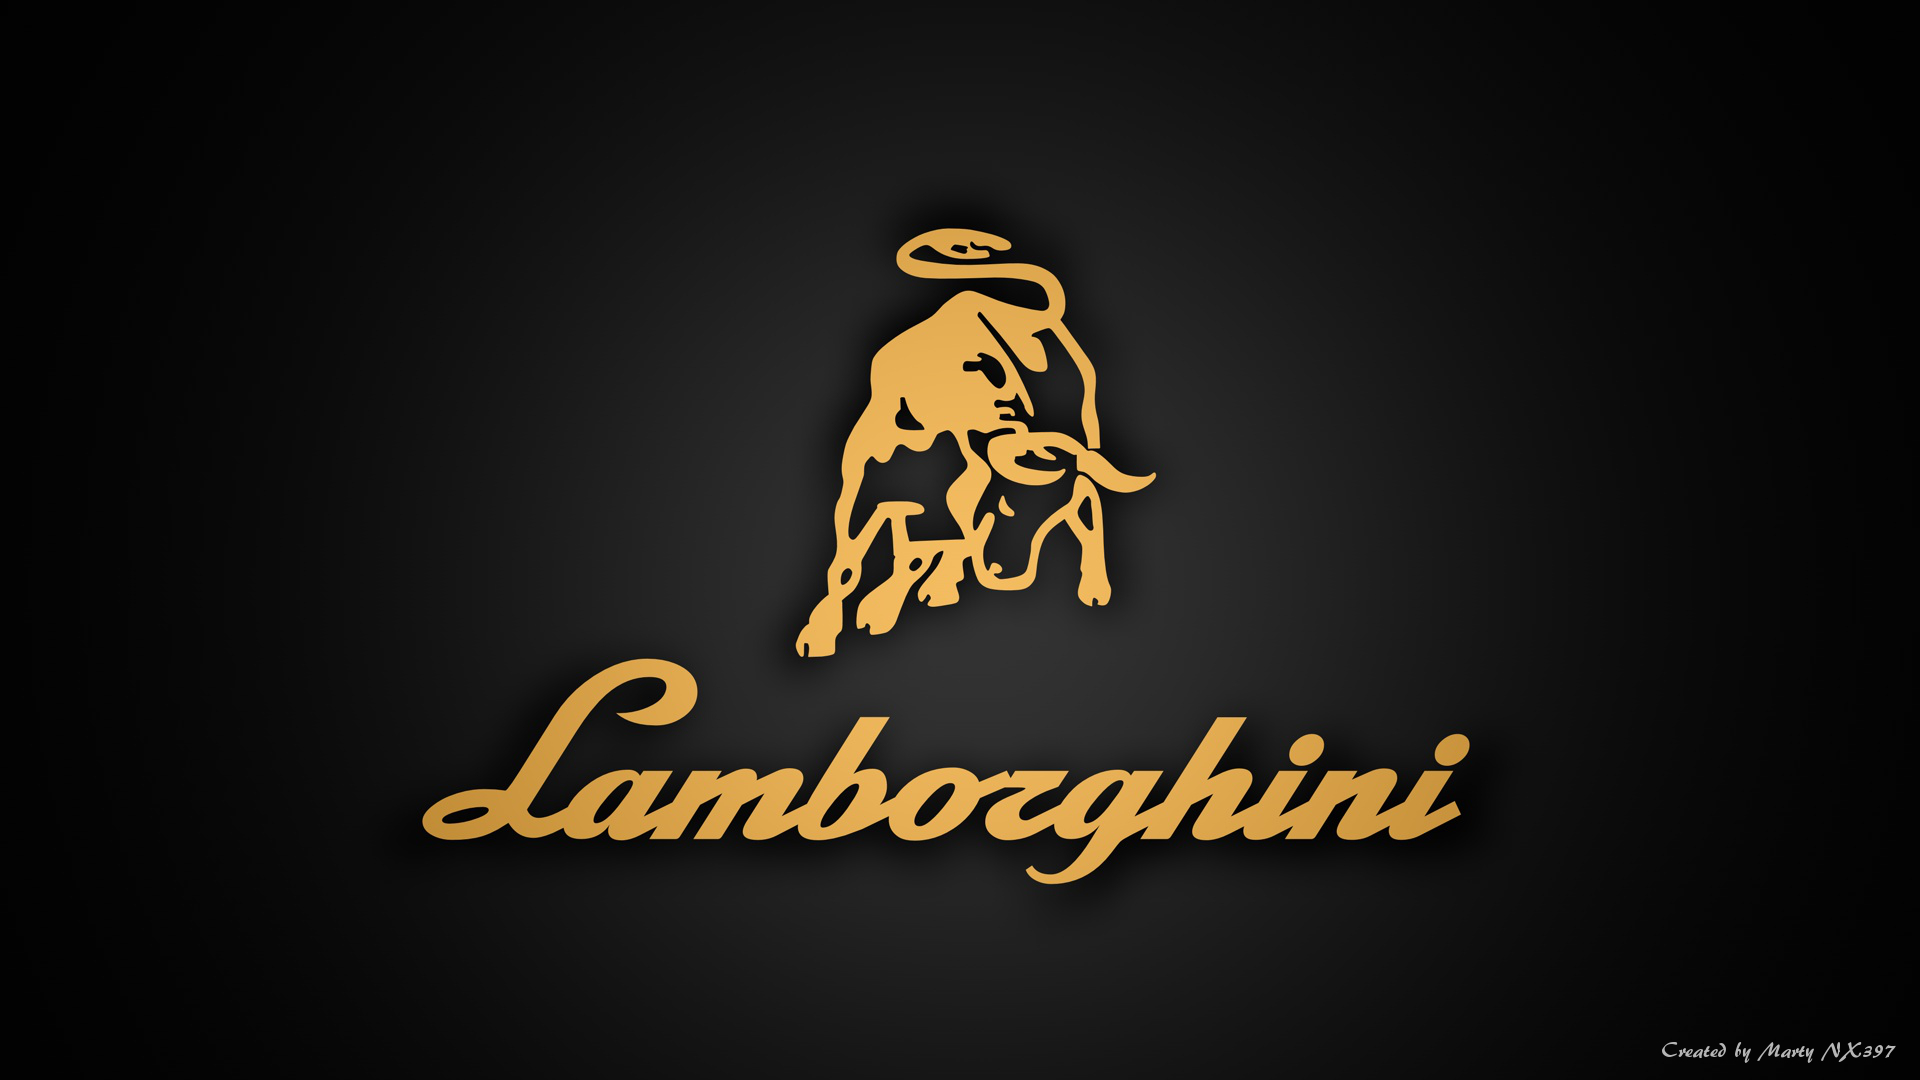 Lamborghini Logo Wallpaper 31 1920x1080